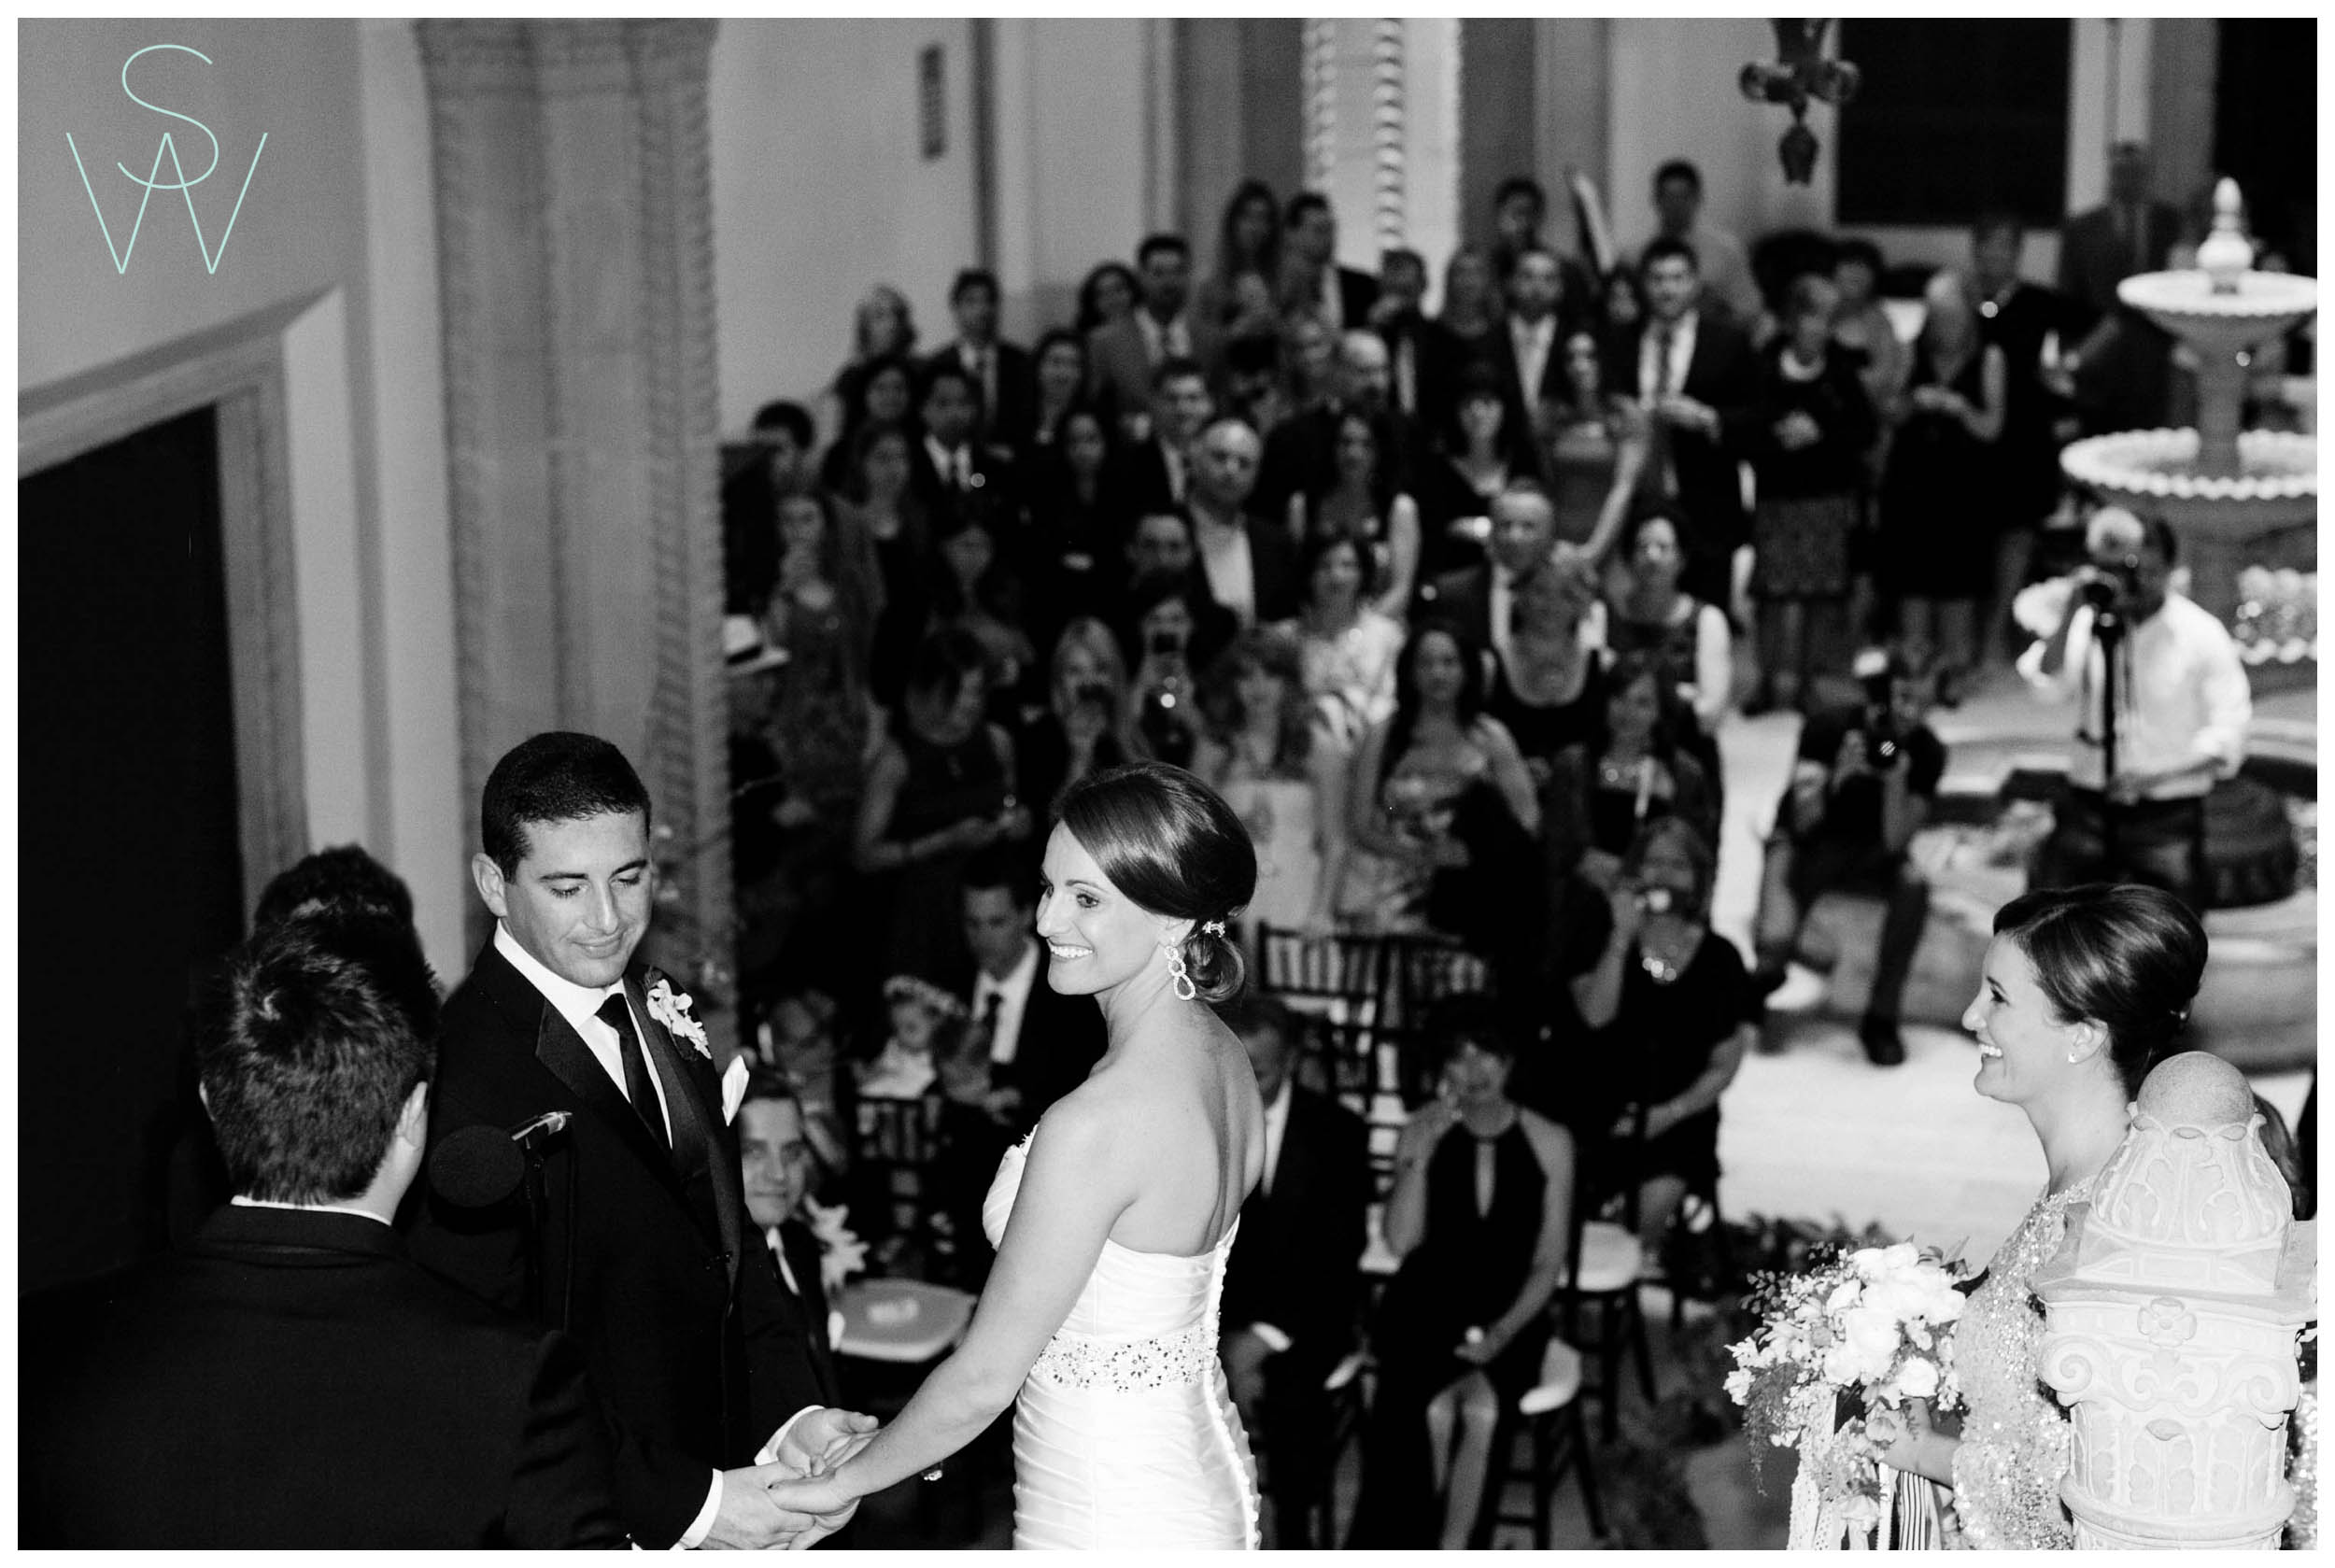 Shewanders.sdma_.wedding.photography-1051.jpg.wedding.photography-1051.jpg